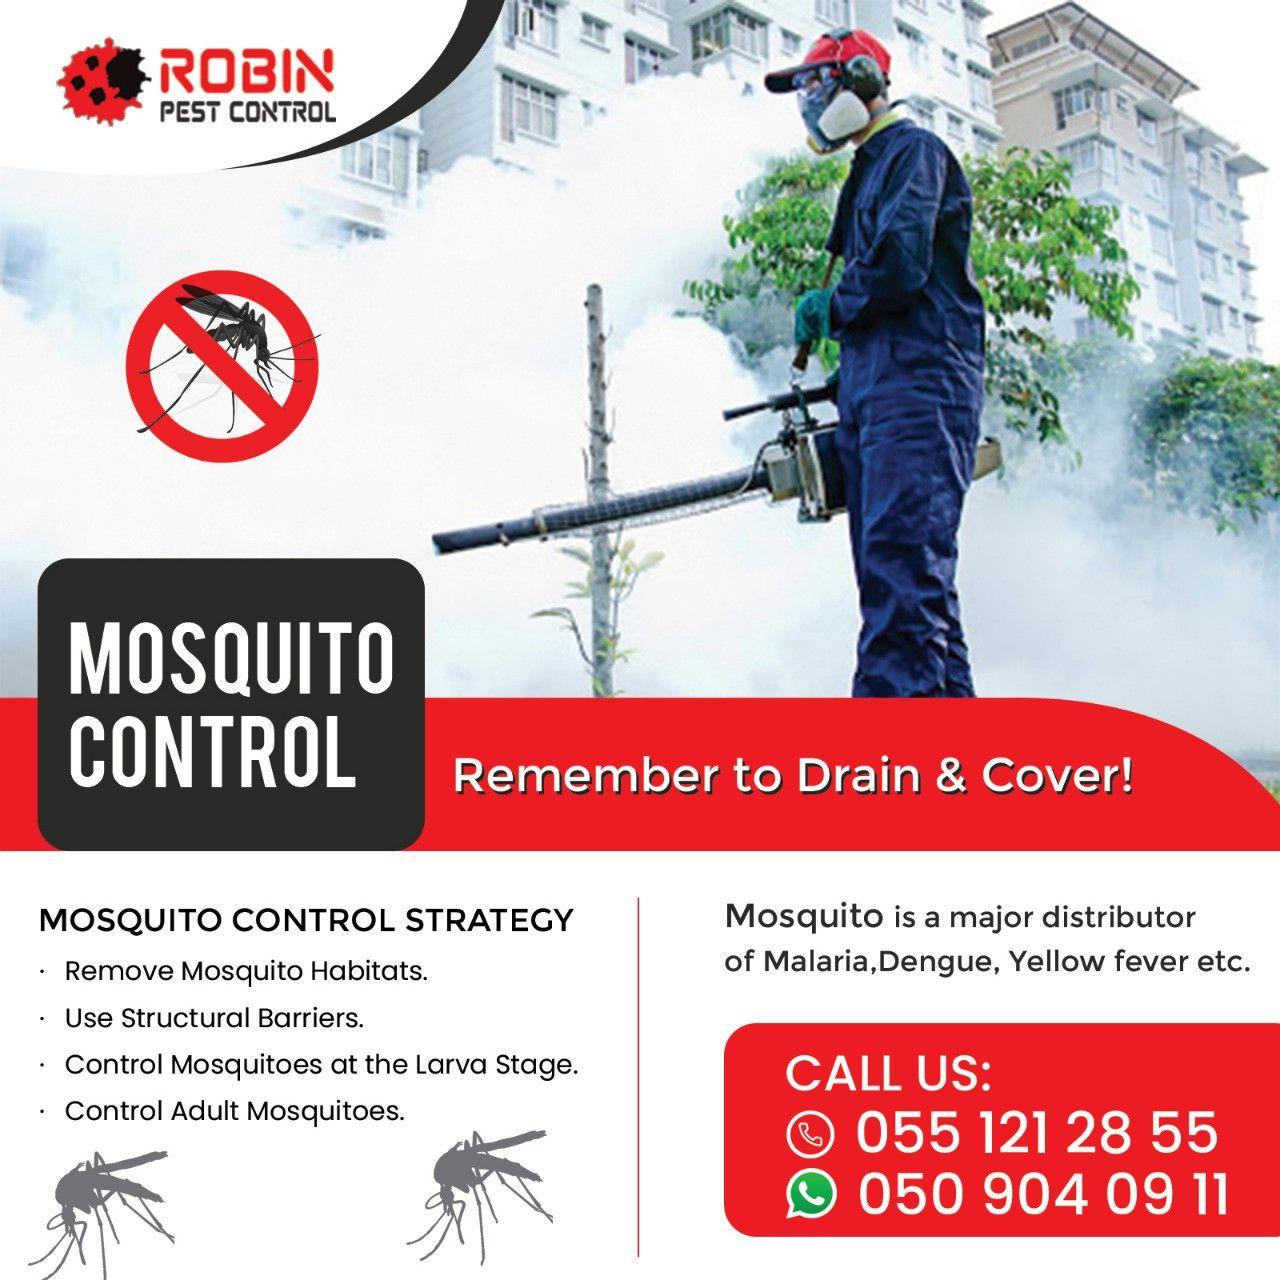 Robin Pest Control 1